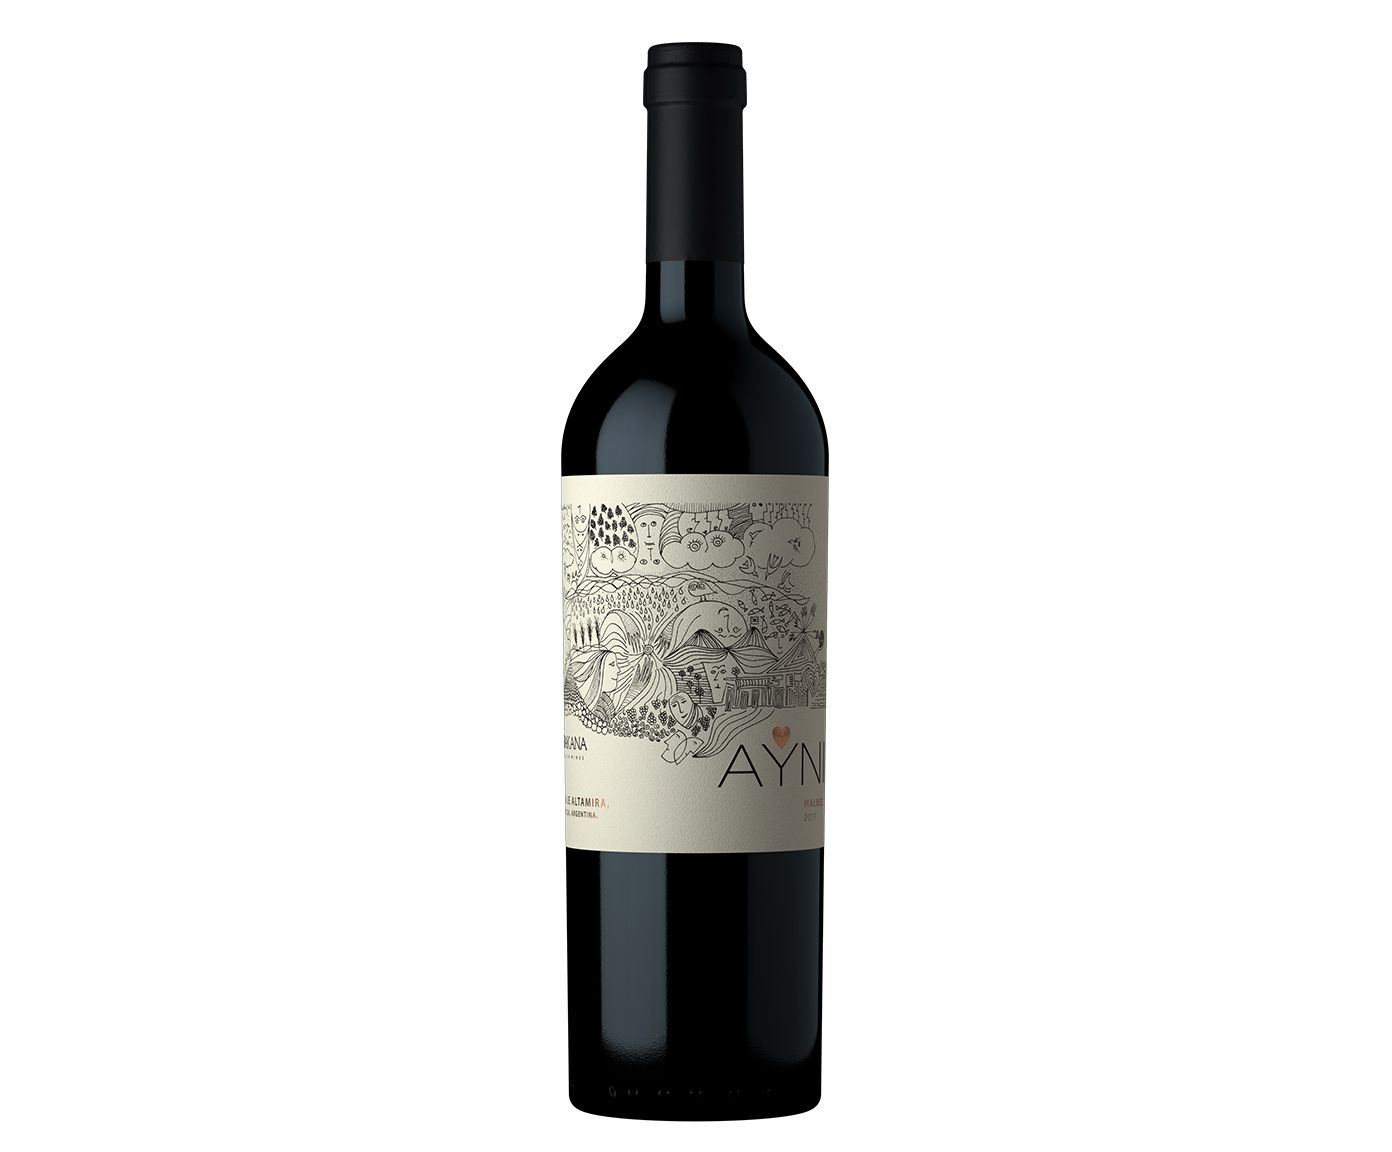 Vinho Tinto Ar Chakana Ayni Malbec - 750ml | Westwing.com.br